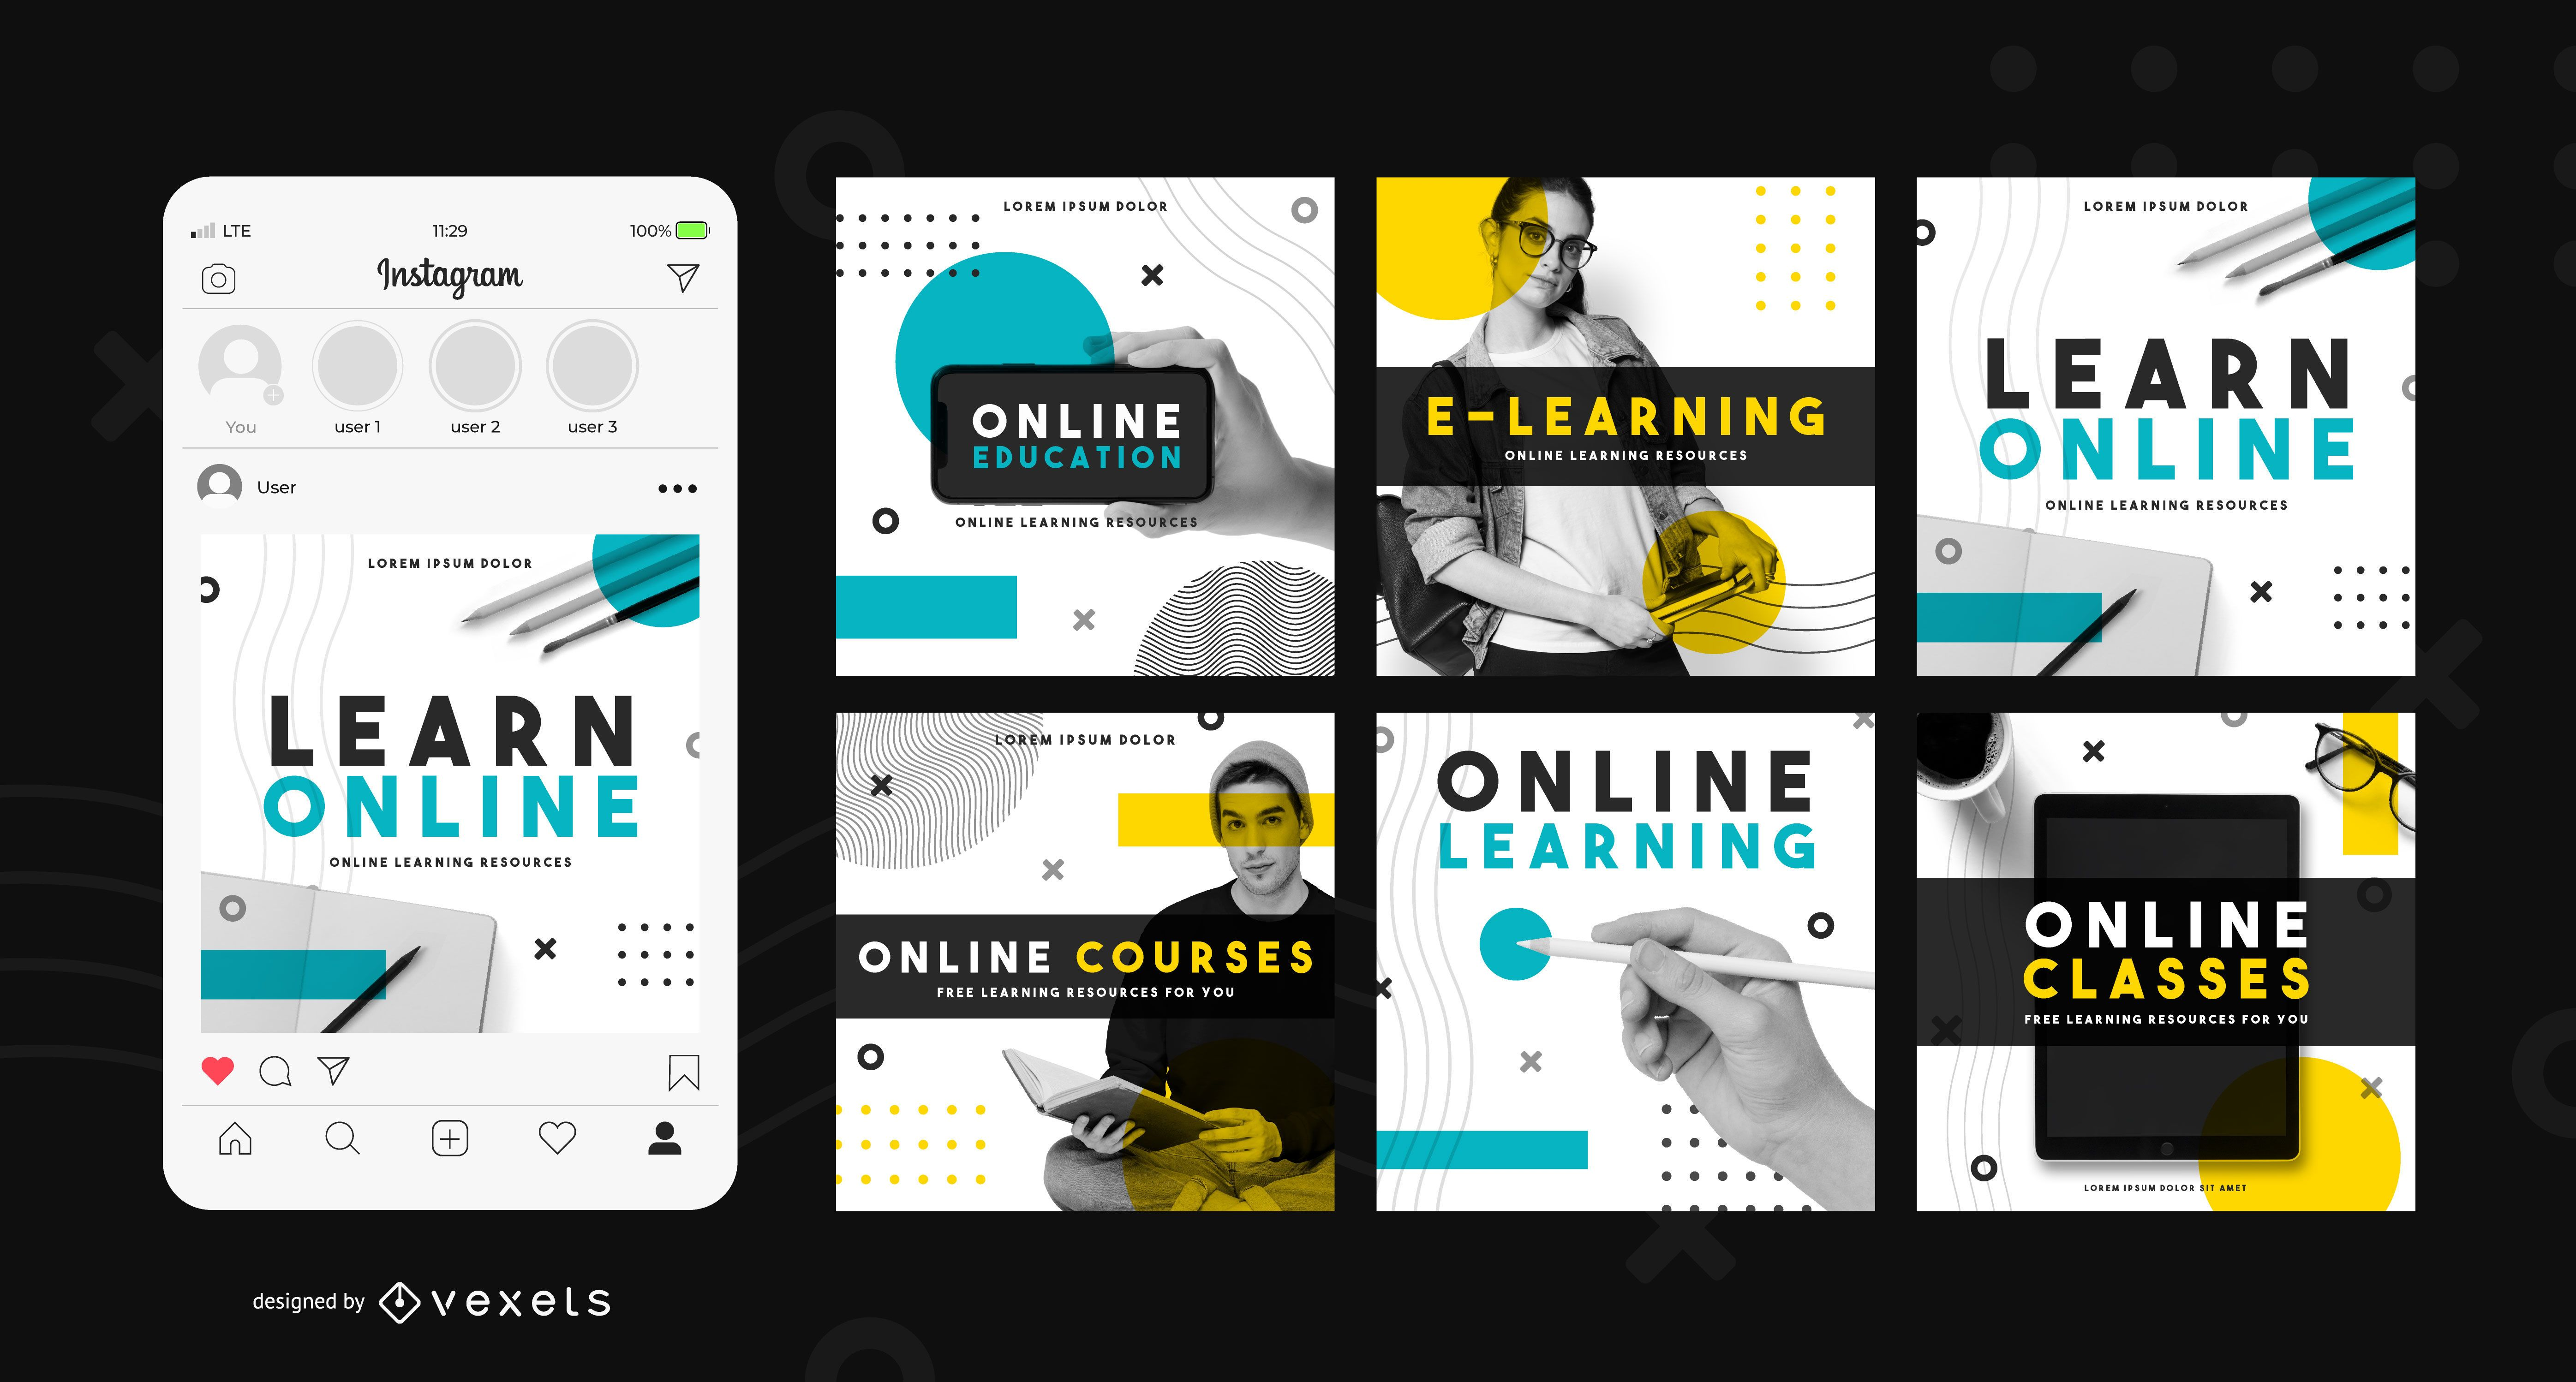 Learn online social media post template